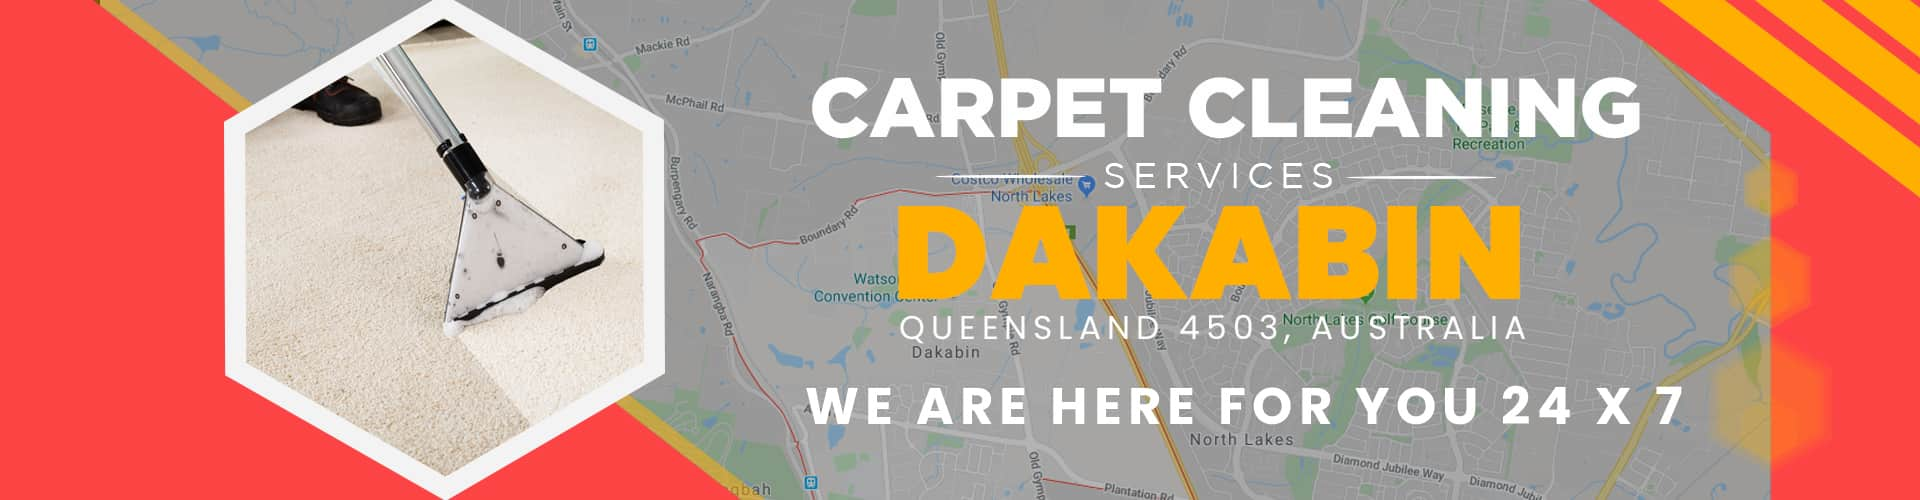 Carpet Cleaning Dakabin